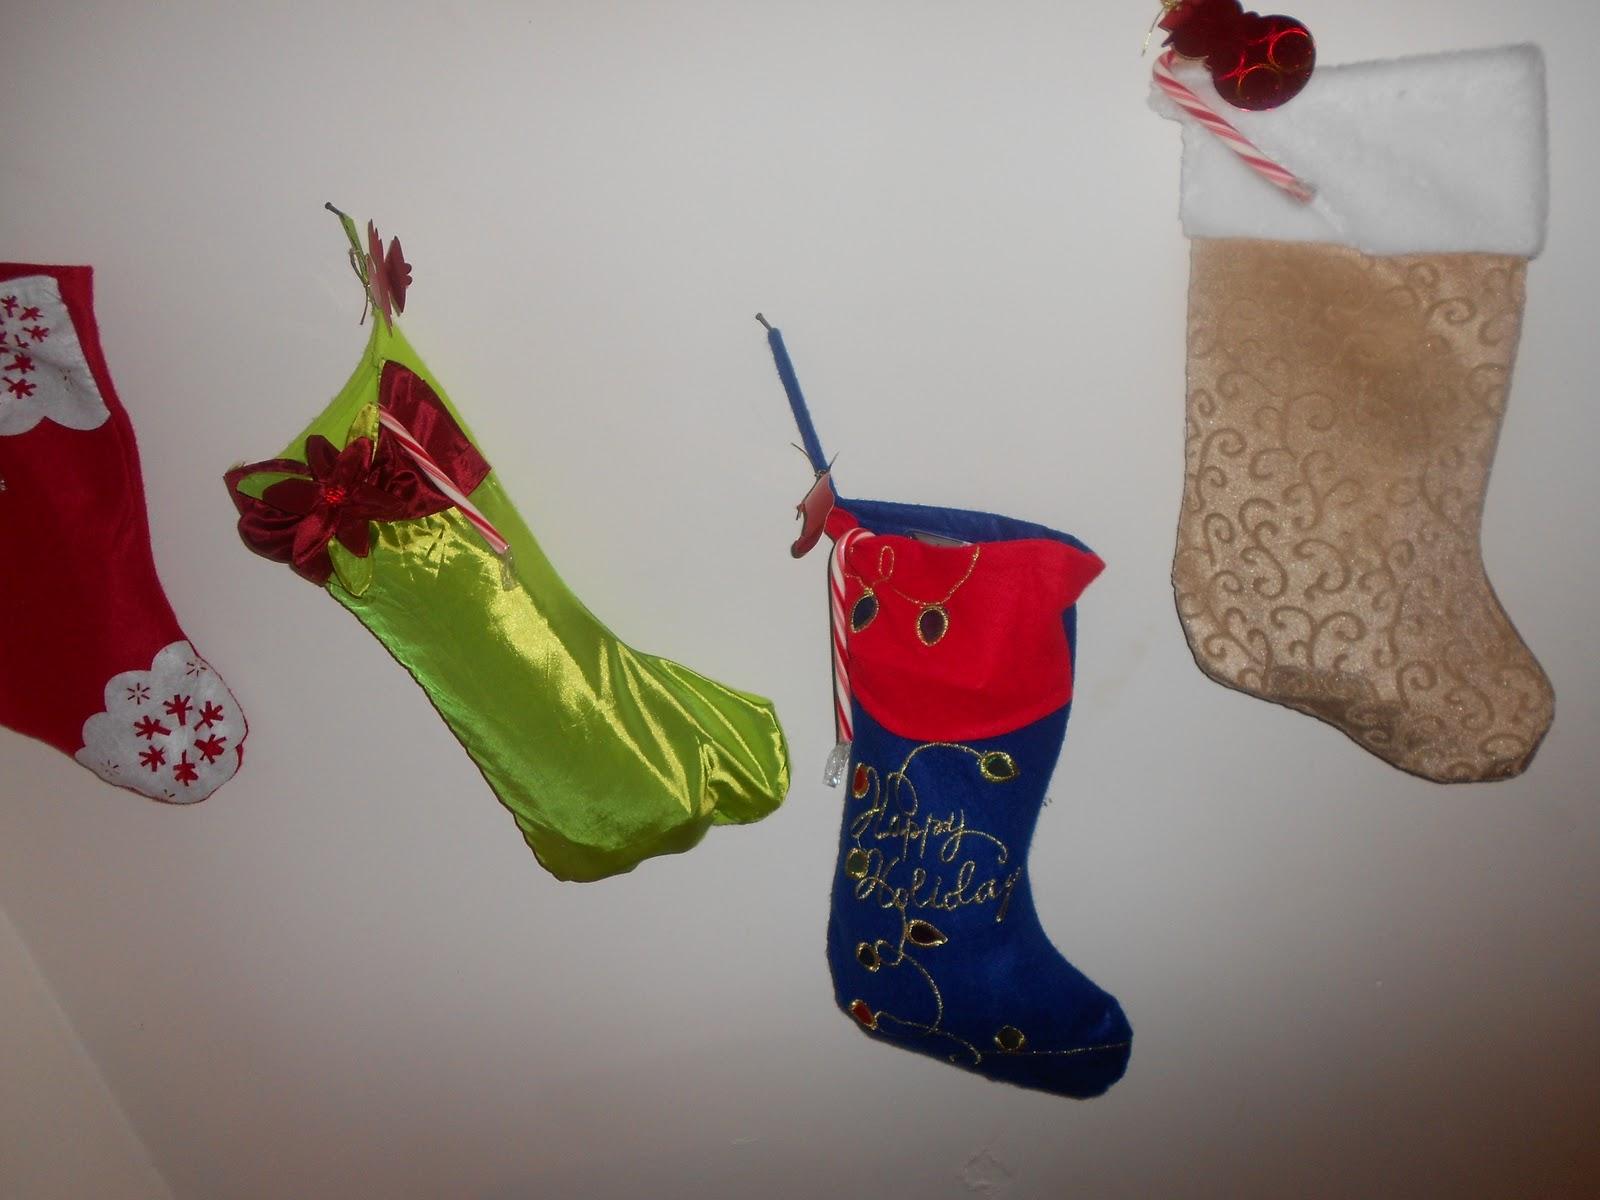 http://1.bp.blogspot.com/-dxNhZDk8QaI/Tvf1ZIpCHTI/AAAAAAAAEOY/ZdxjSxHTb0E/s1600/Christmas+2011+006.JPG